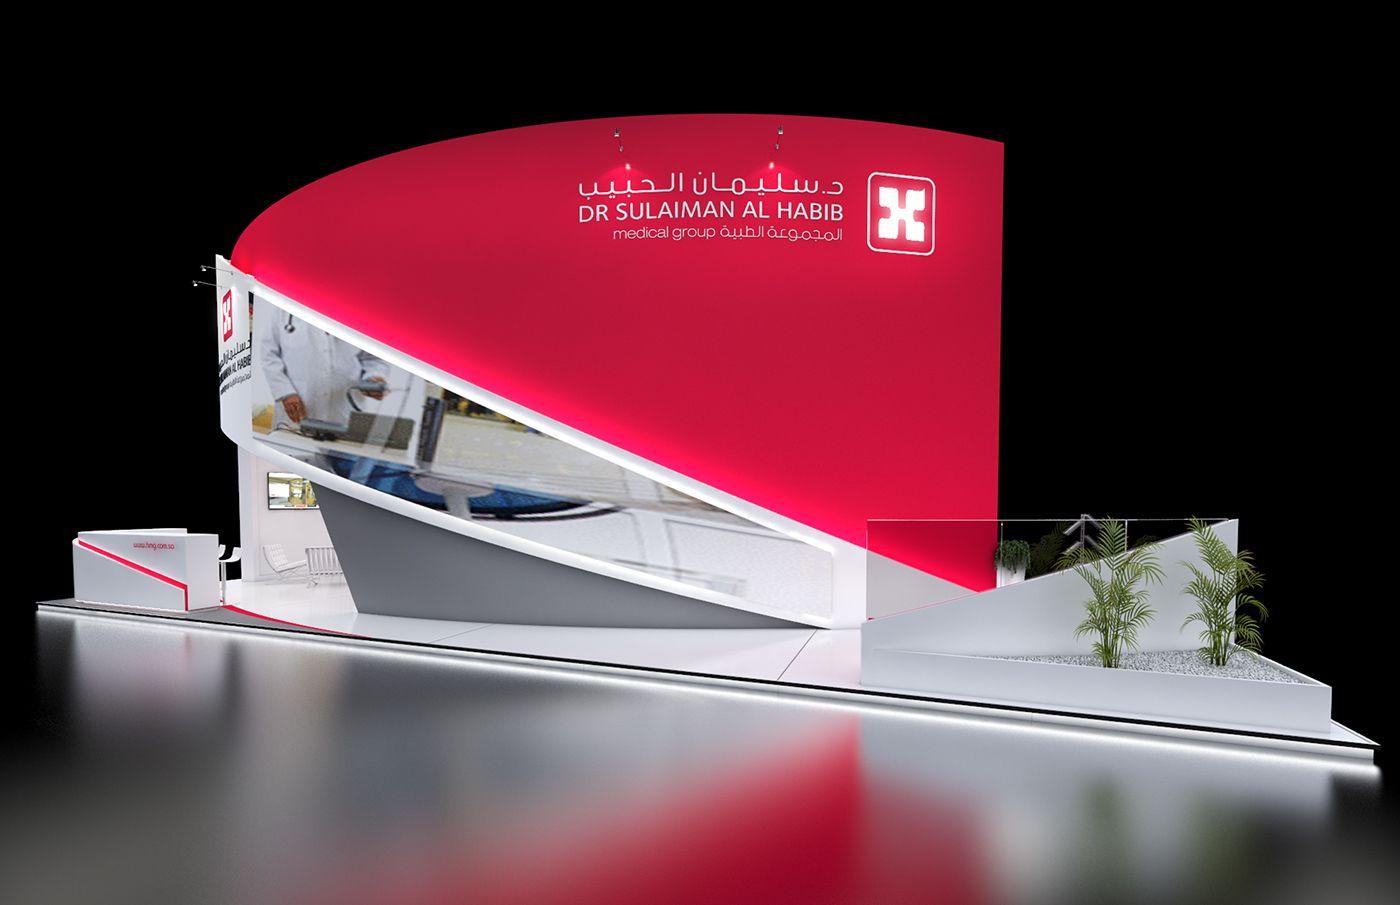 Dr Sulaiman Al Habib Arab Health 2016 On Behance Booth Design Kiosk Design Exhibition Booth Design